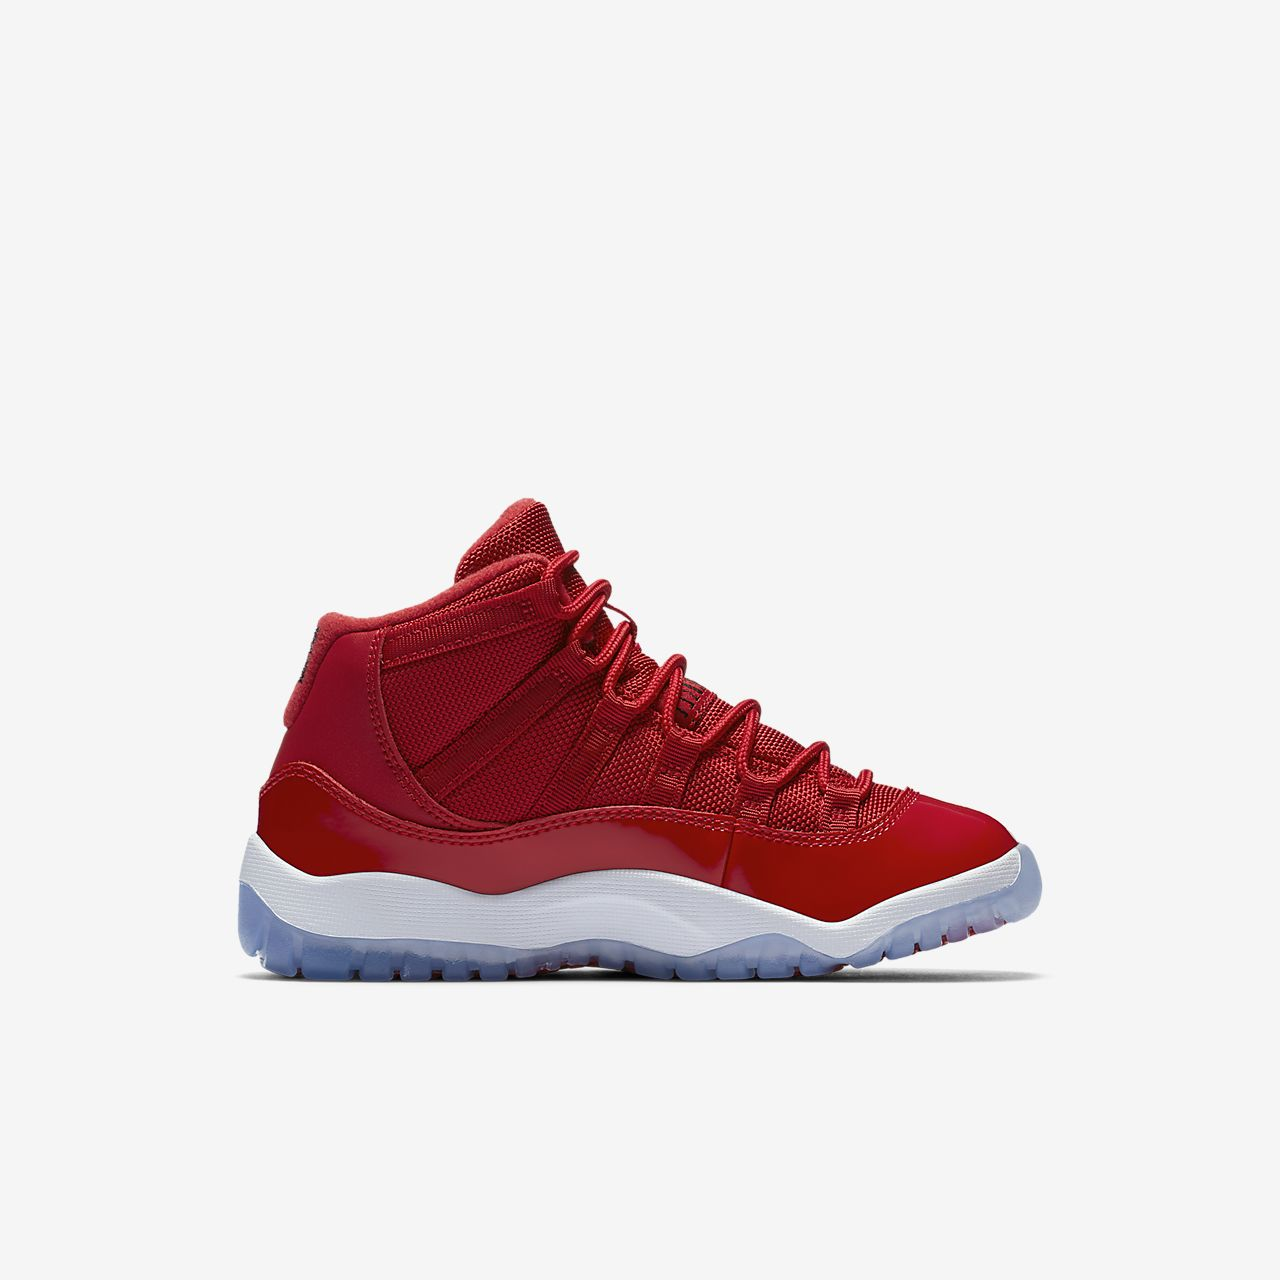 ... Air Jordan XI Retro Three-Quarter Younger Kids' Shoe